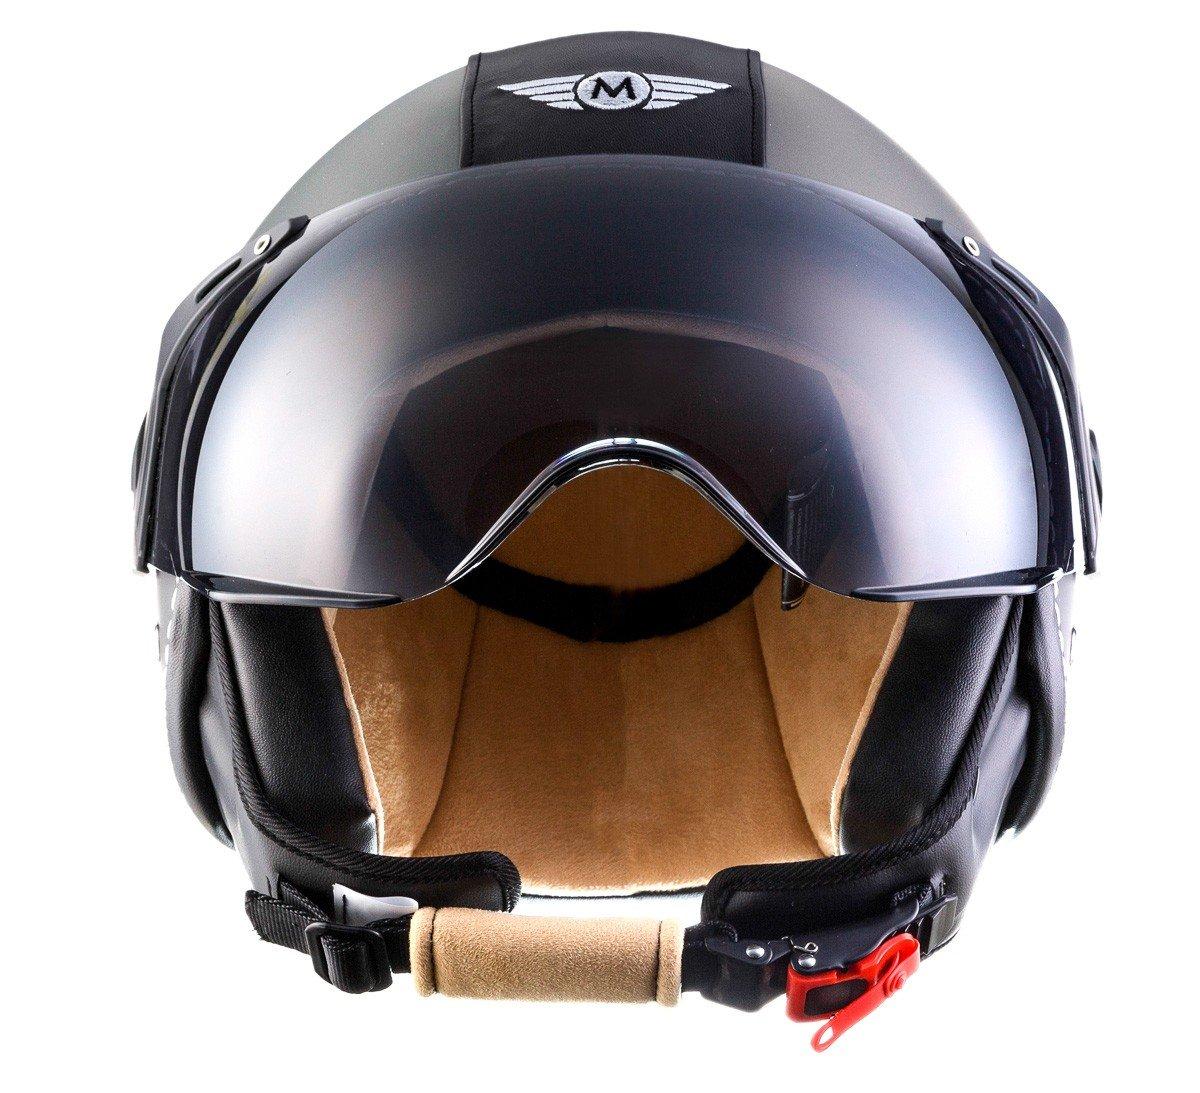 Amazon.es: Moto Helmets H44 - Helmet Casco de Moto, Gris/Negro, M (57-58cm)